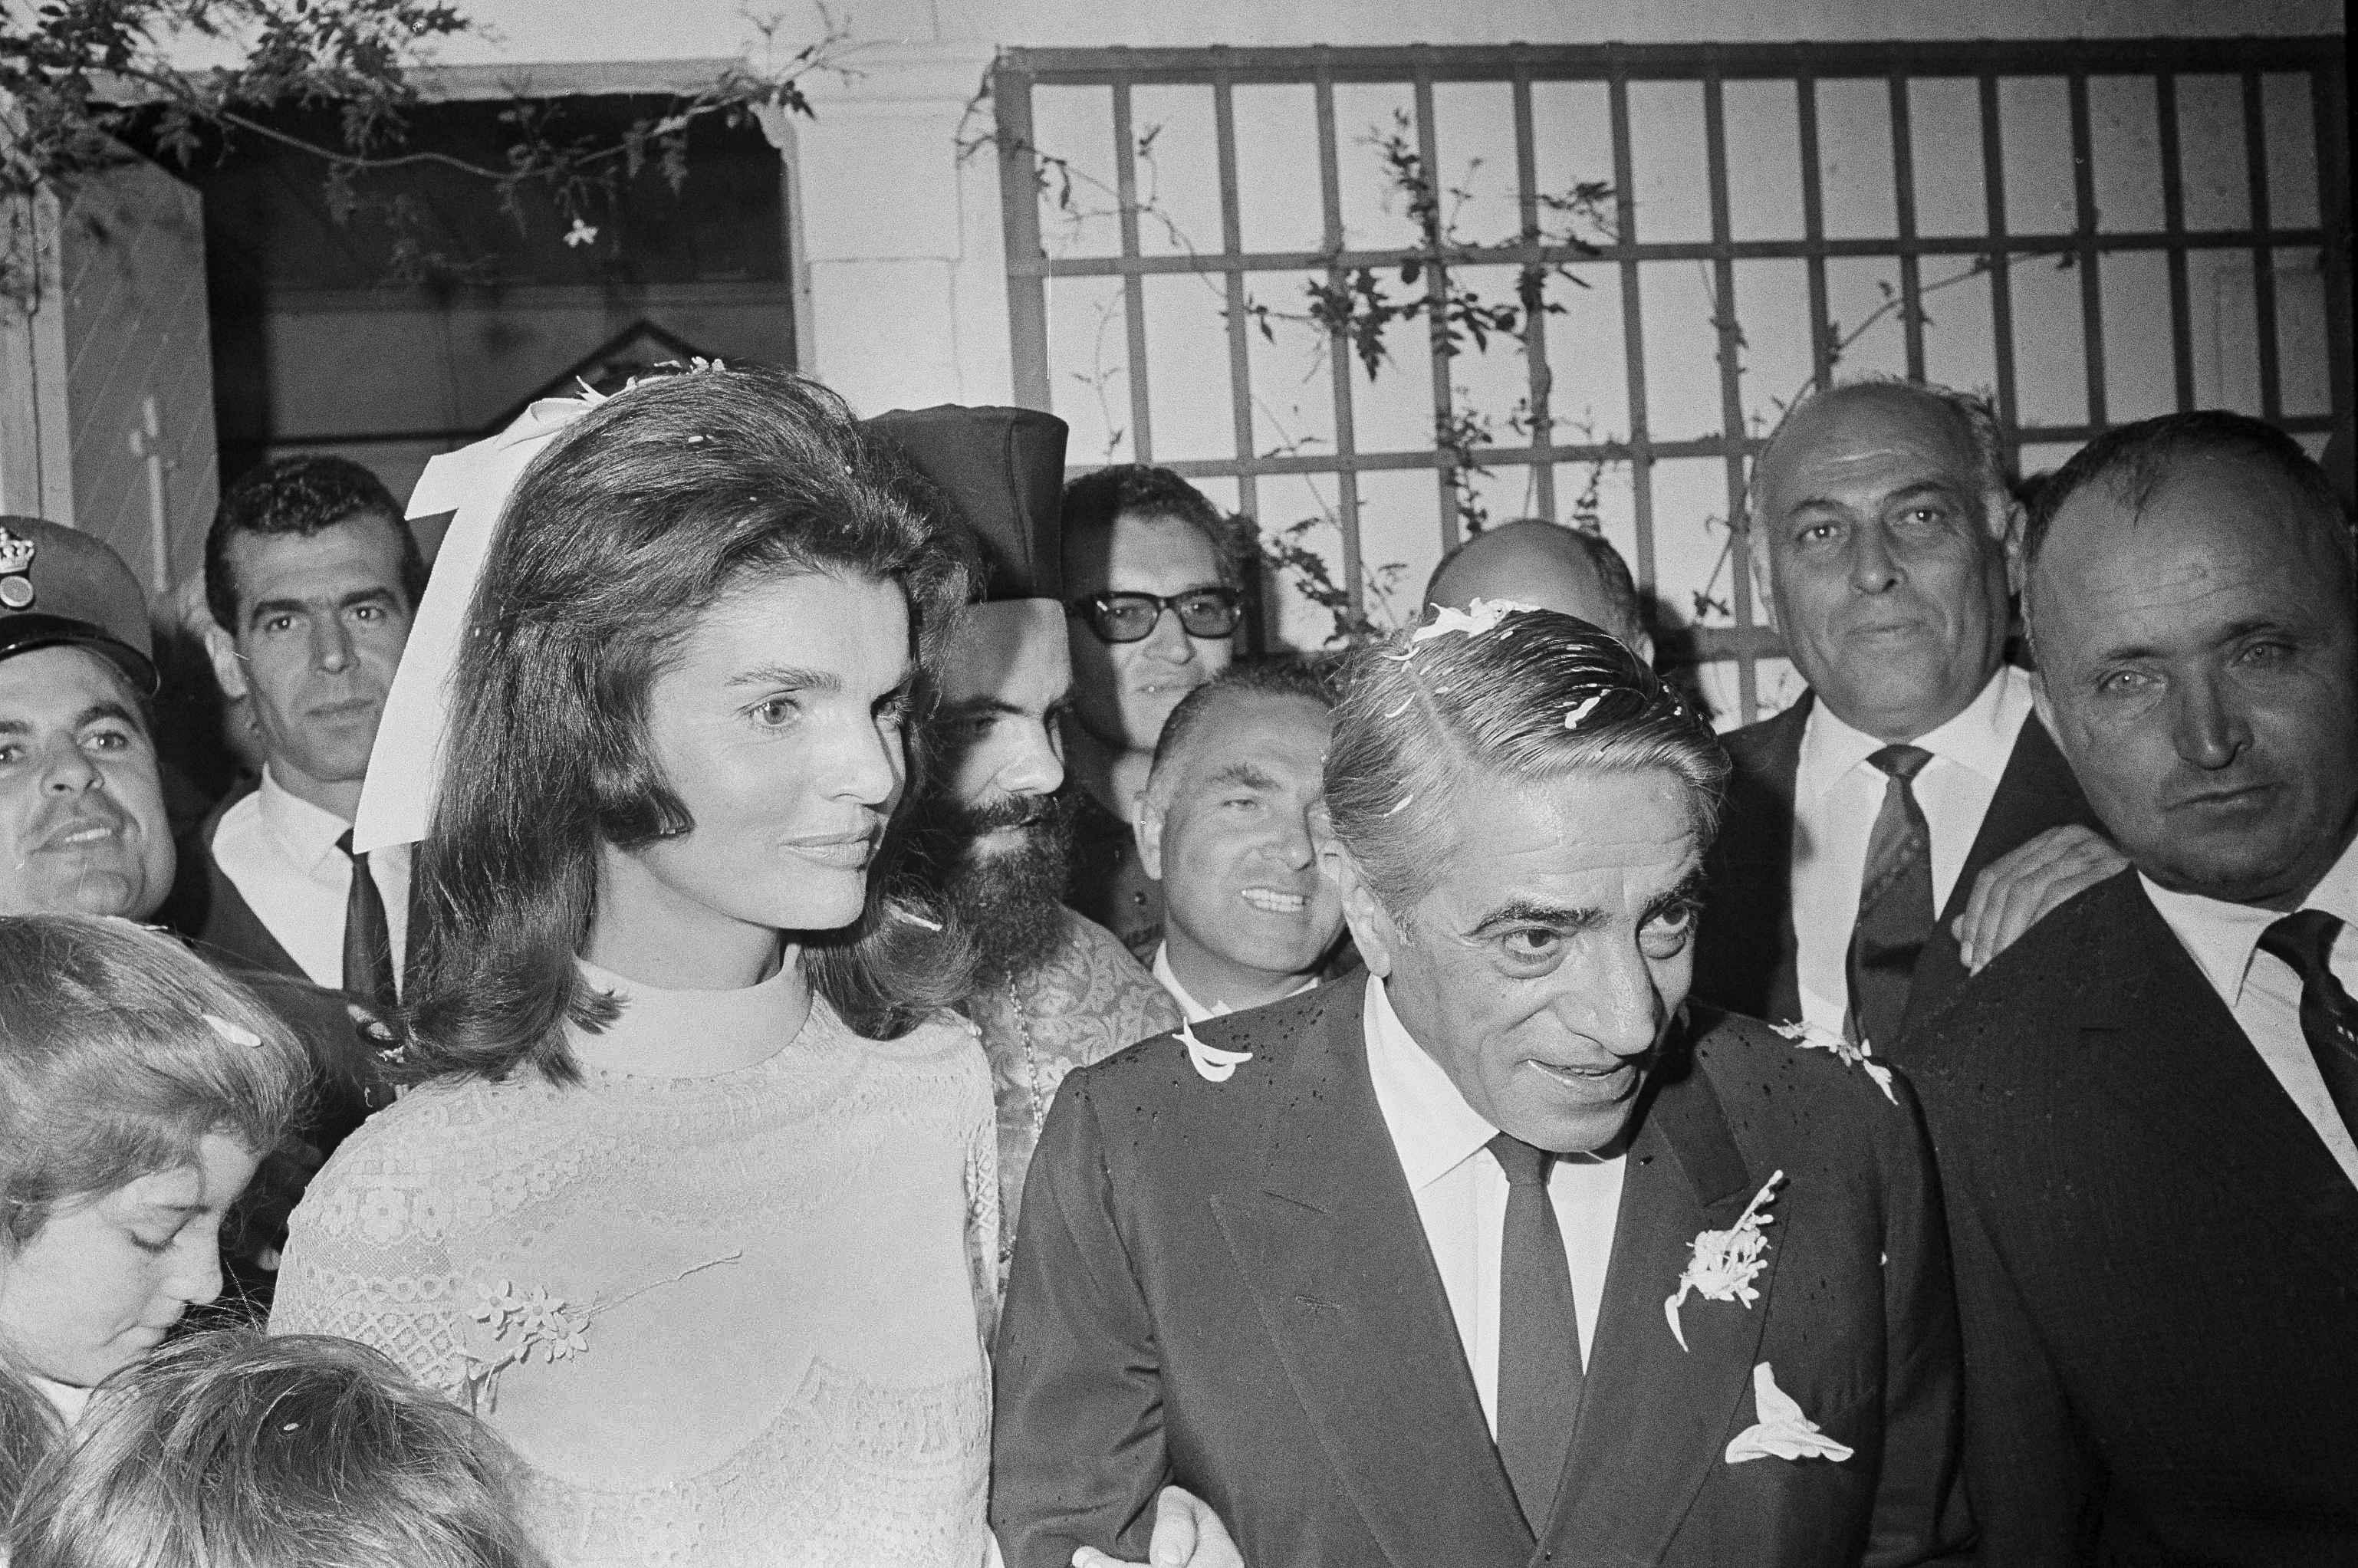 Jackie Kennedy Jfk S Widow Married Aristotle Onassis 50 Years Ago